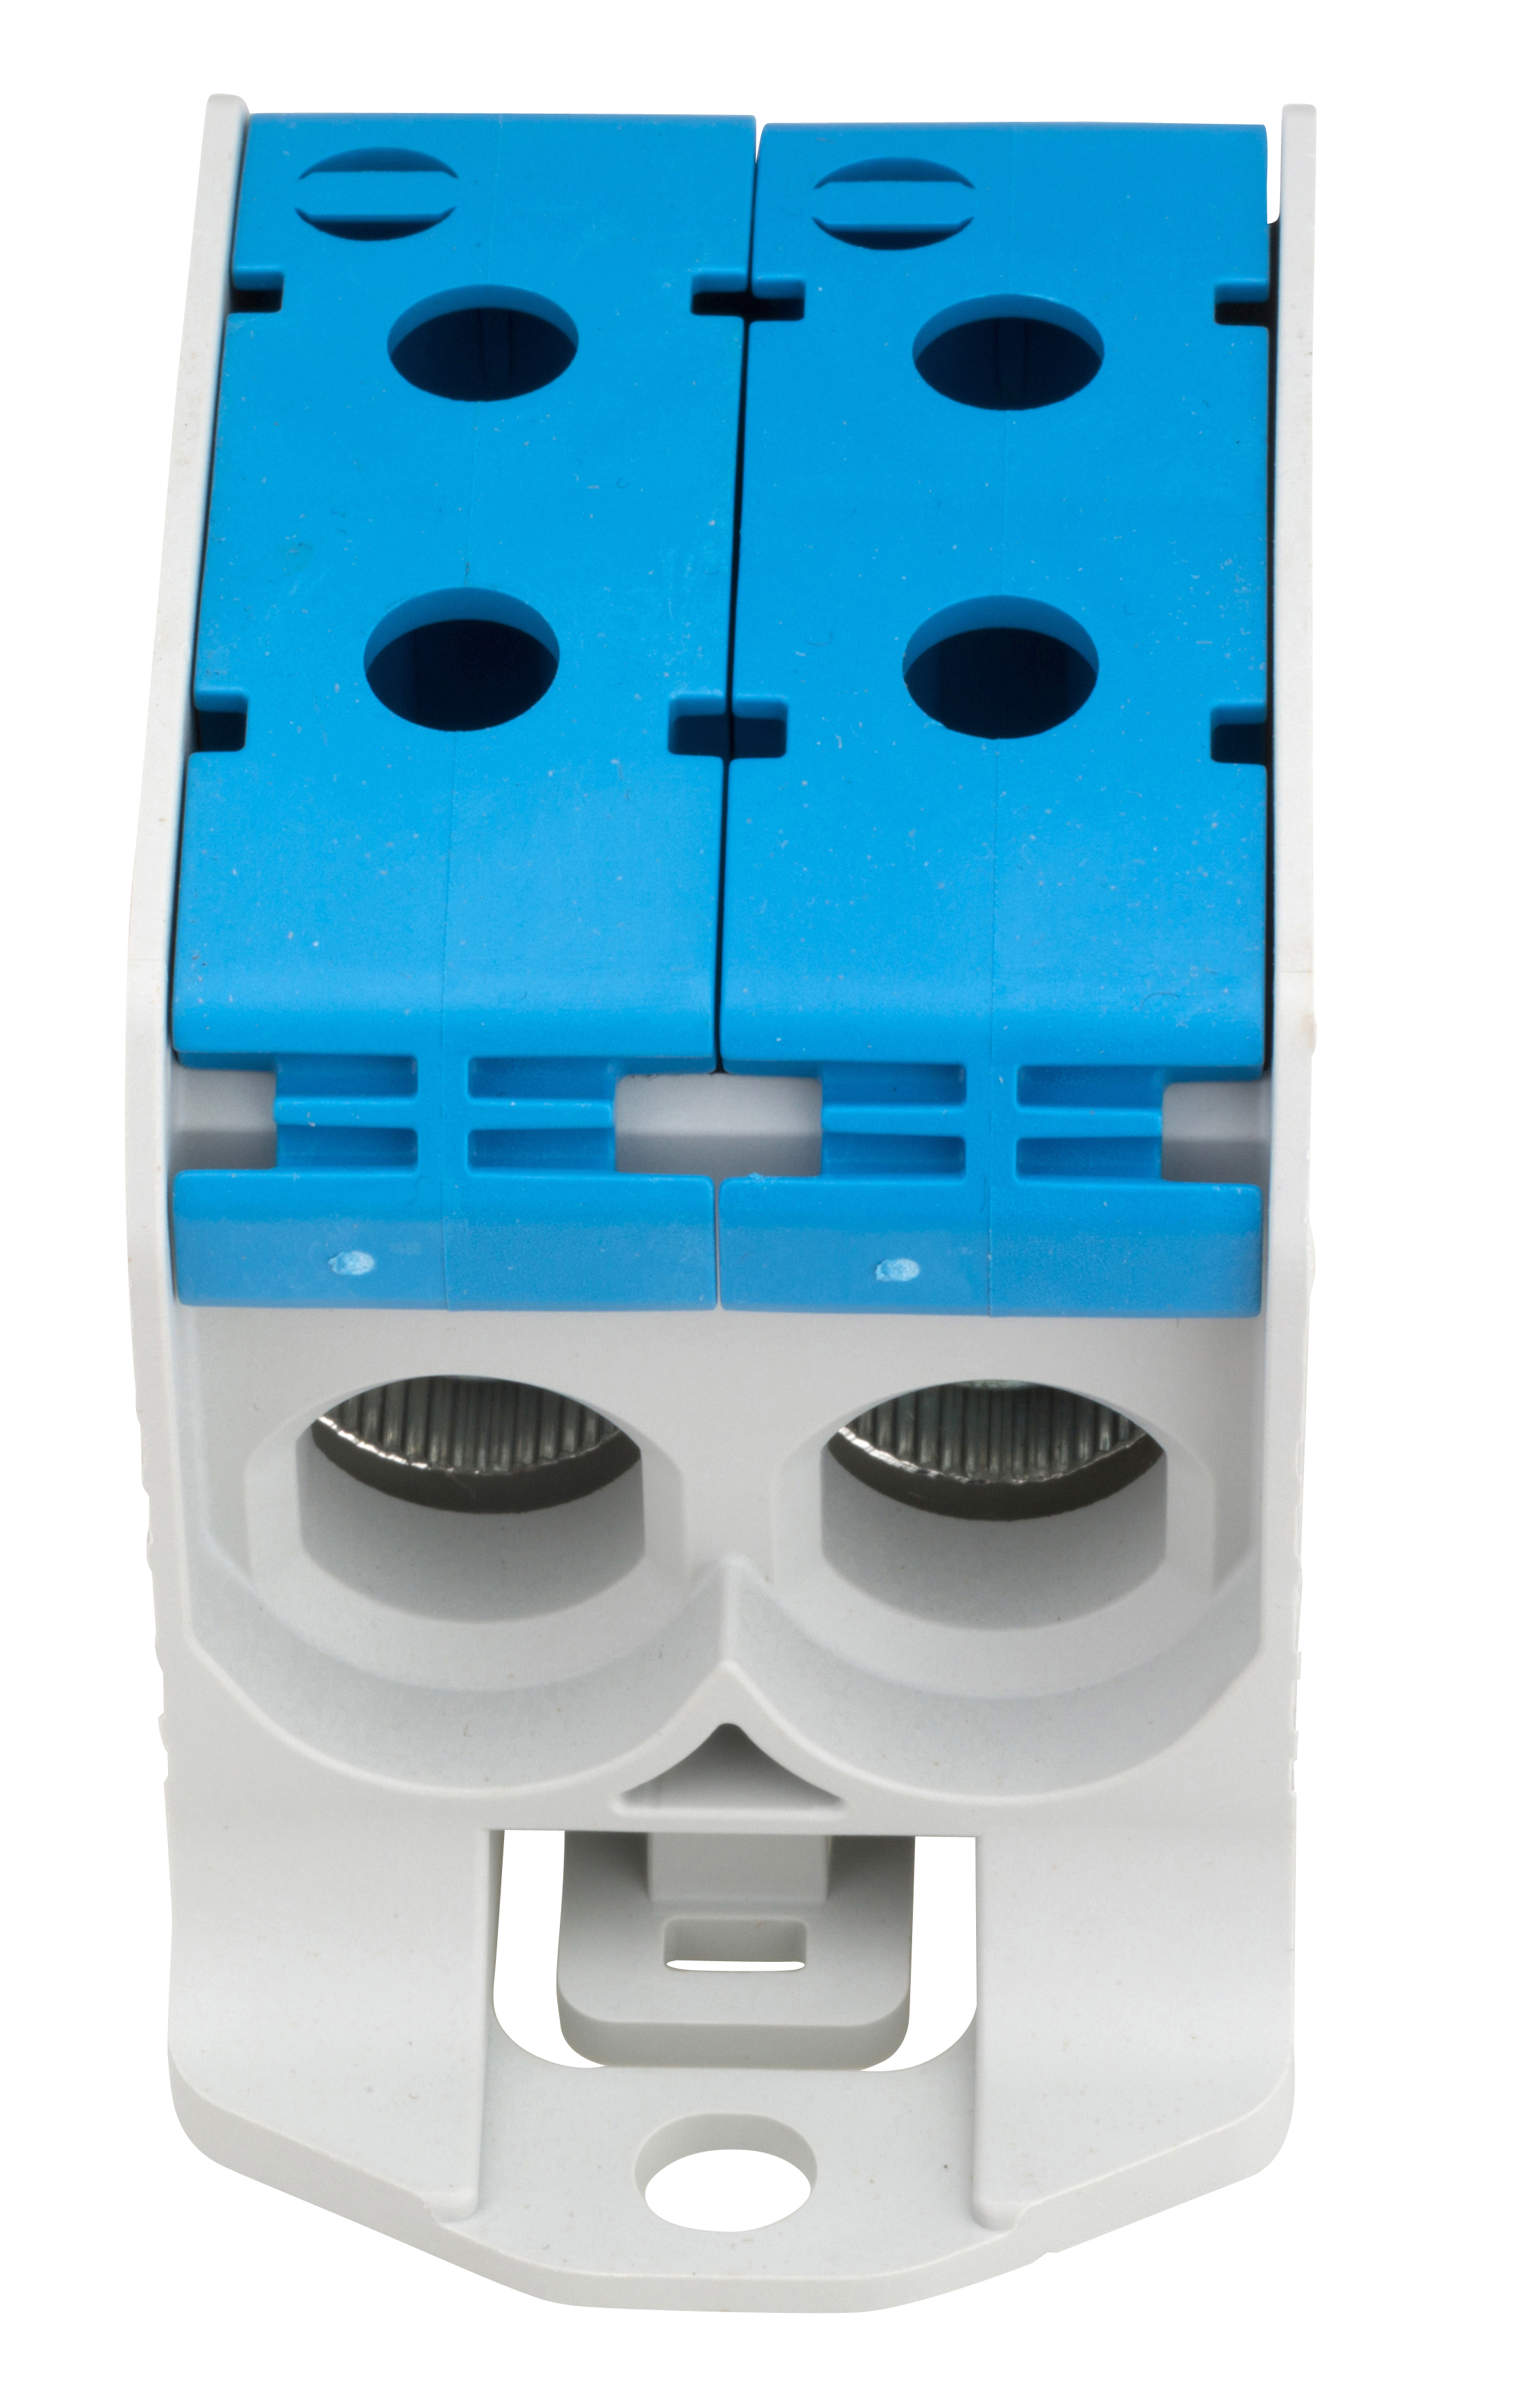 1 Stk Aluminium /Kupfer Klemme, 1-polig, Doppel 95mm² blau IKA21426--